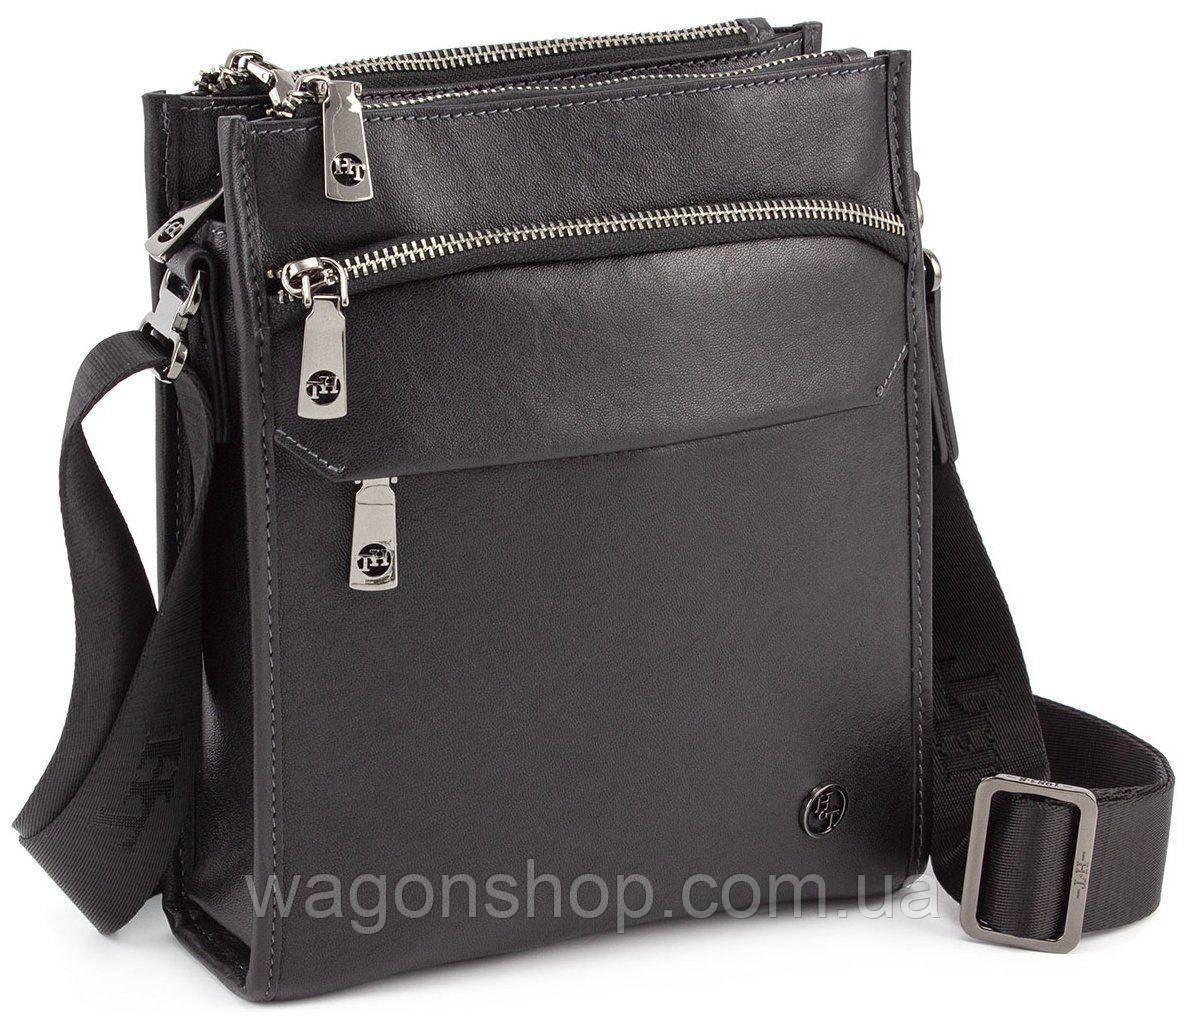 Повседневная мужская сумка планшет с плечевым ремнем H.T Leather (10164)